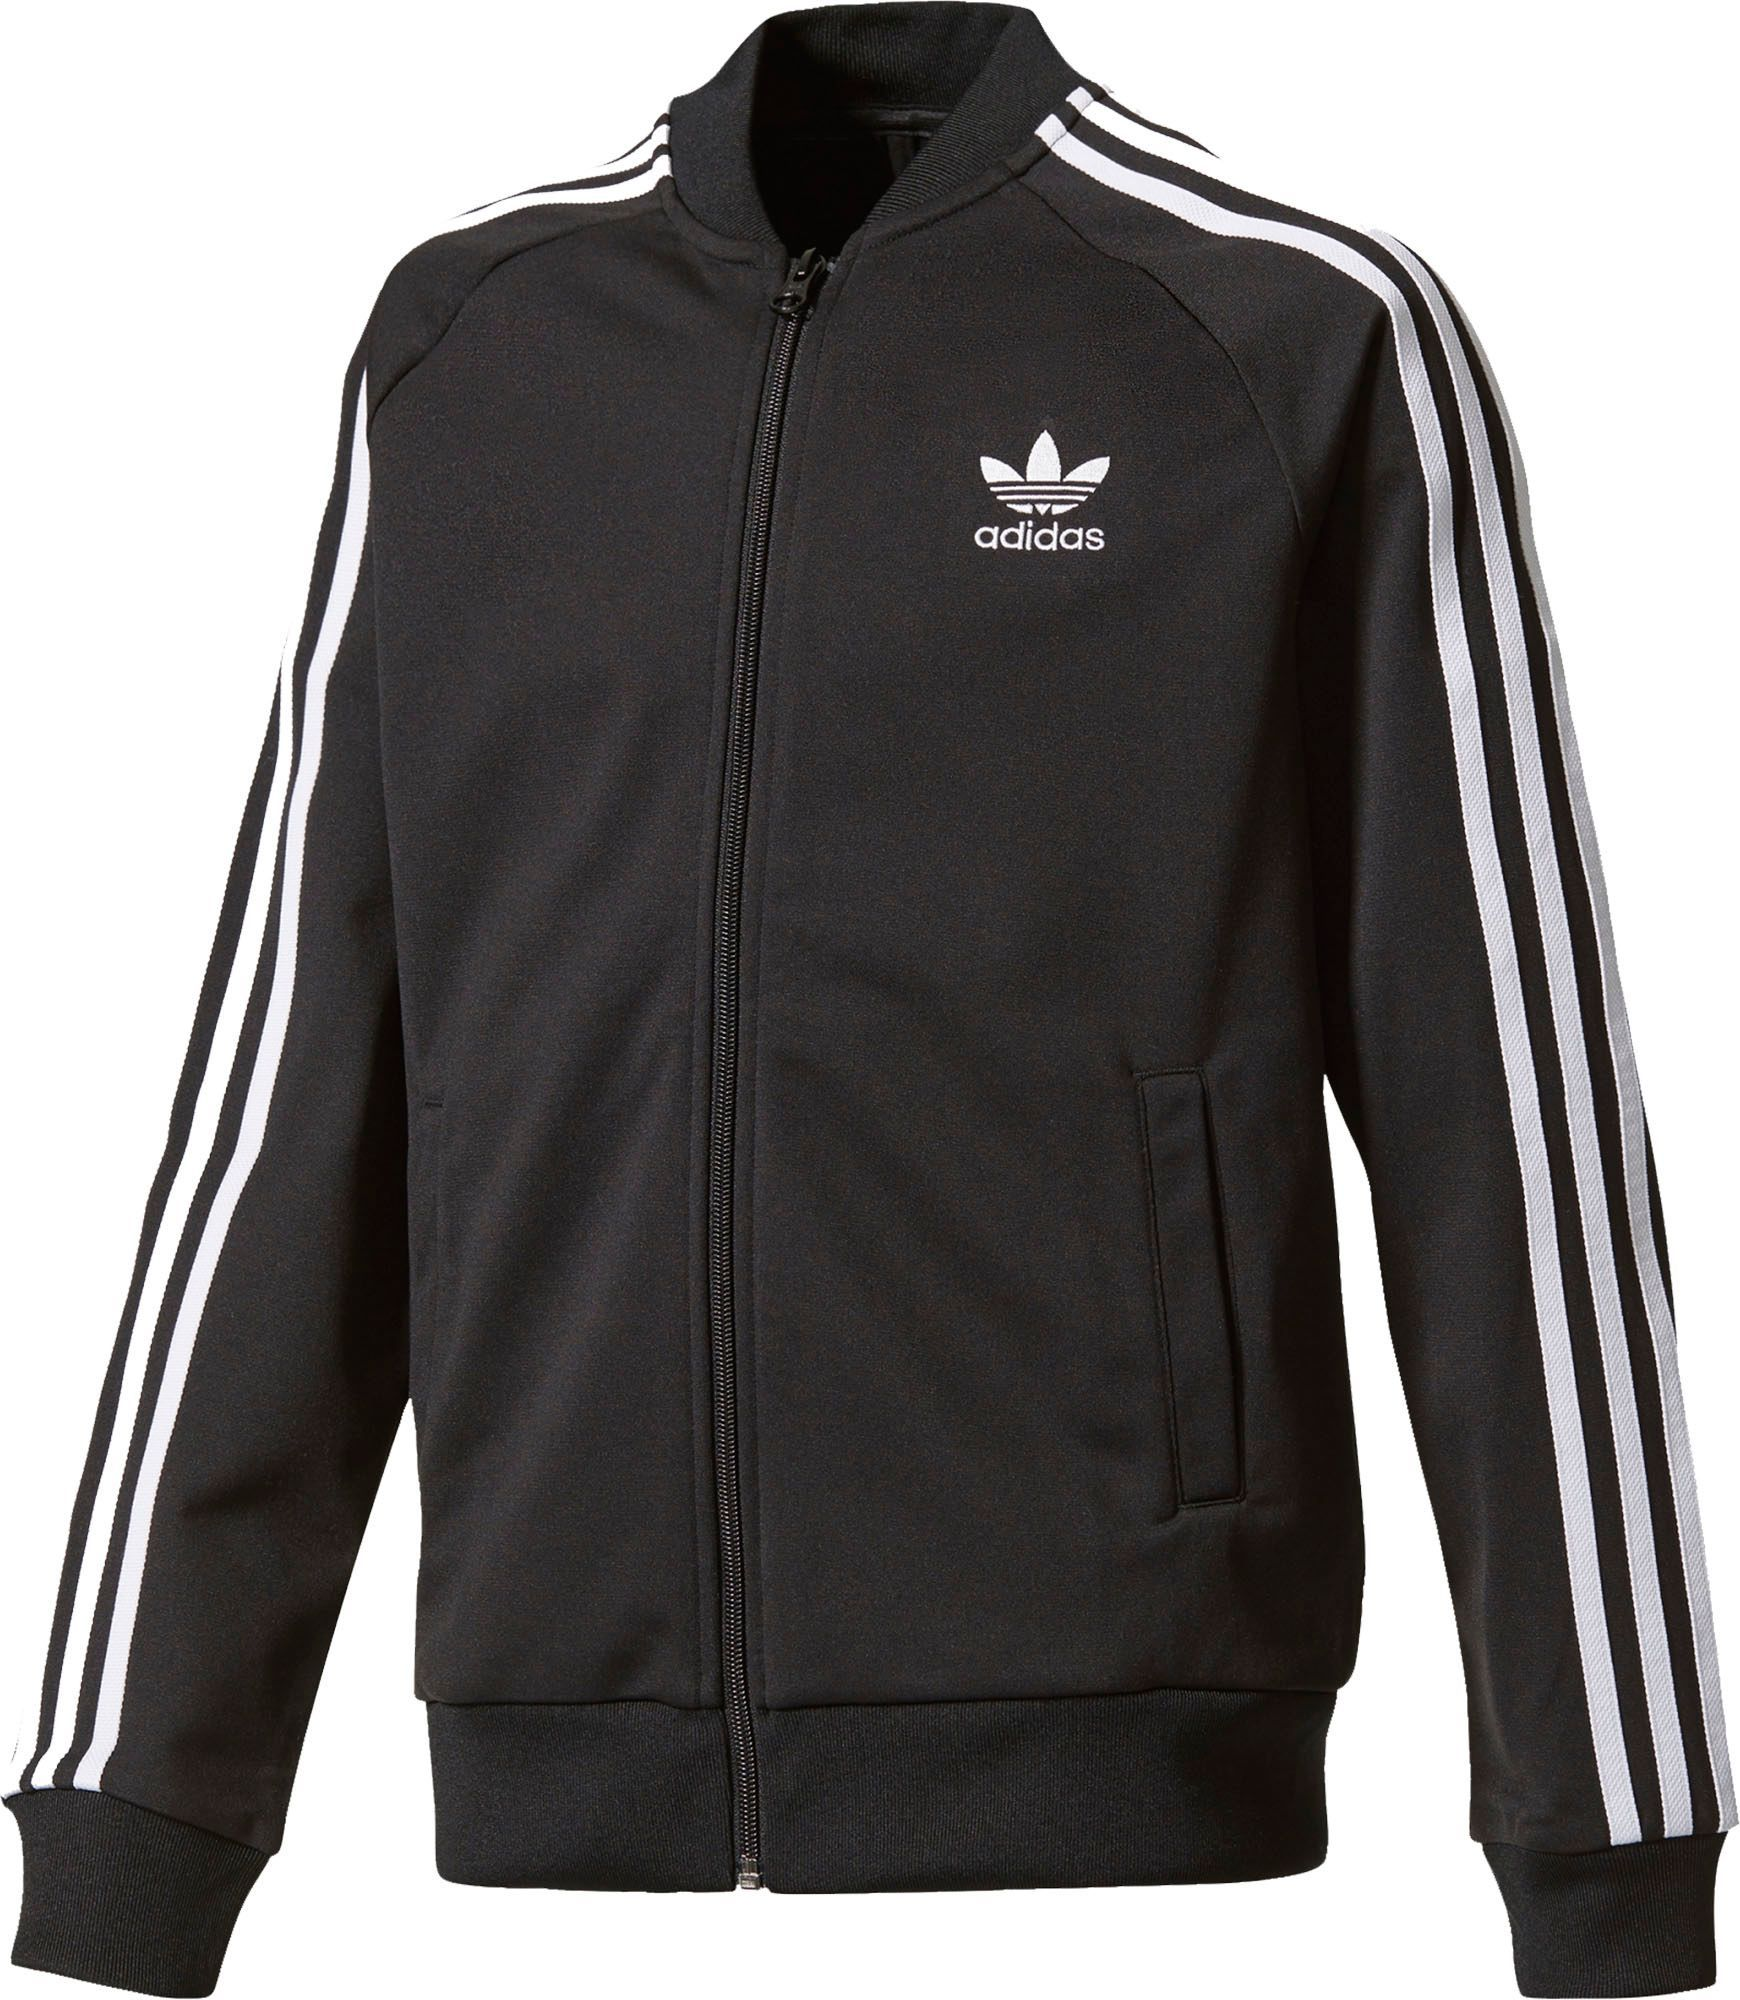 adidas Originals Boys' Superstar Track Jacket, Size: XL